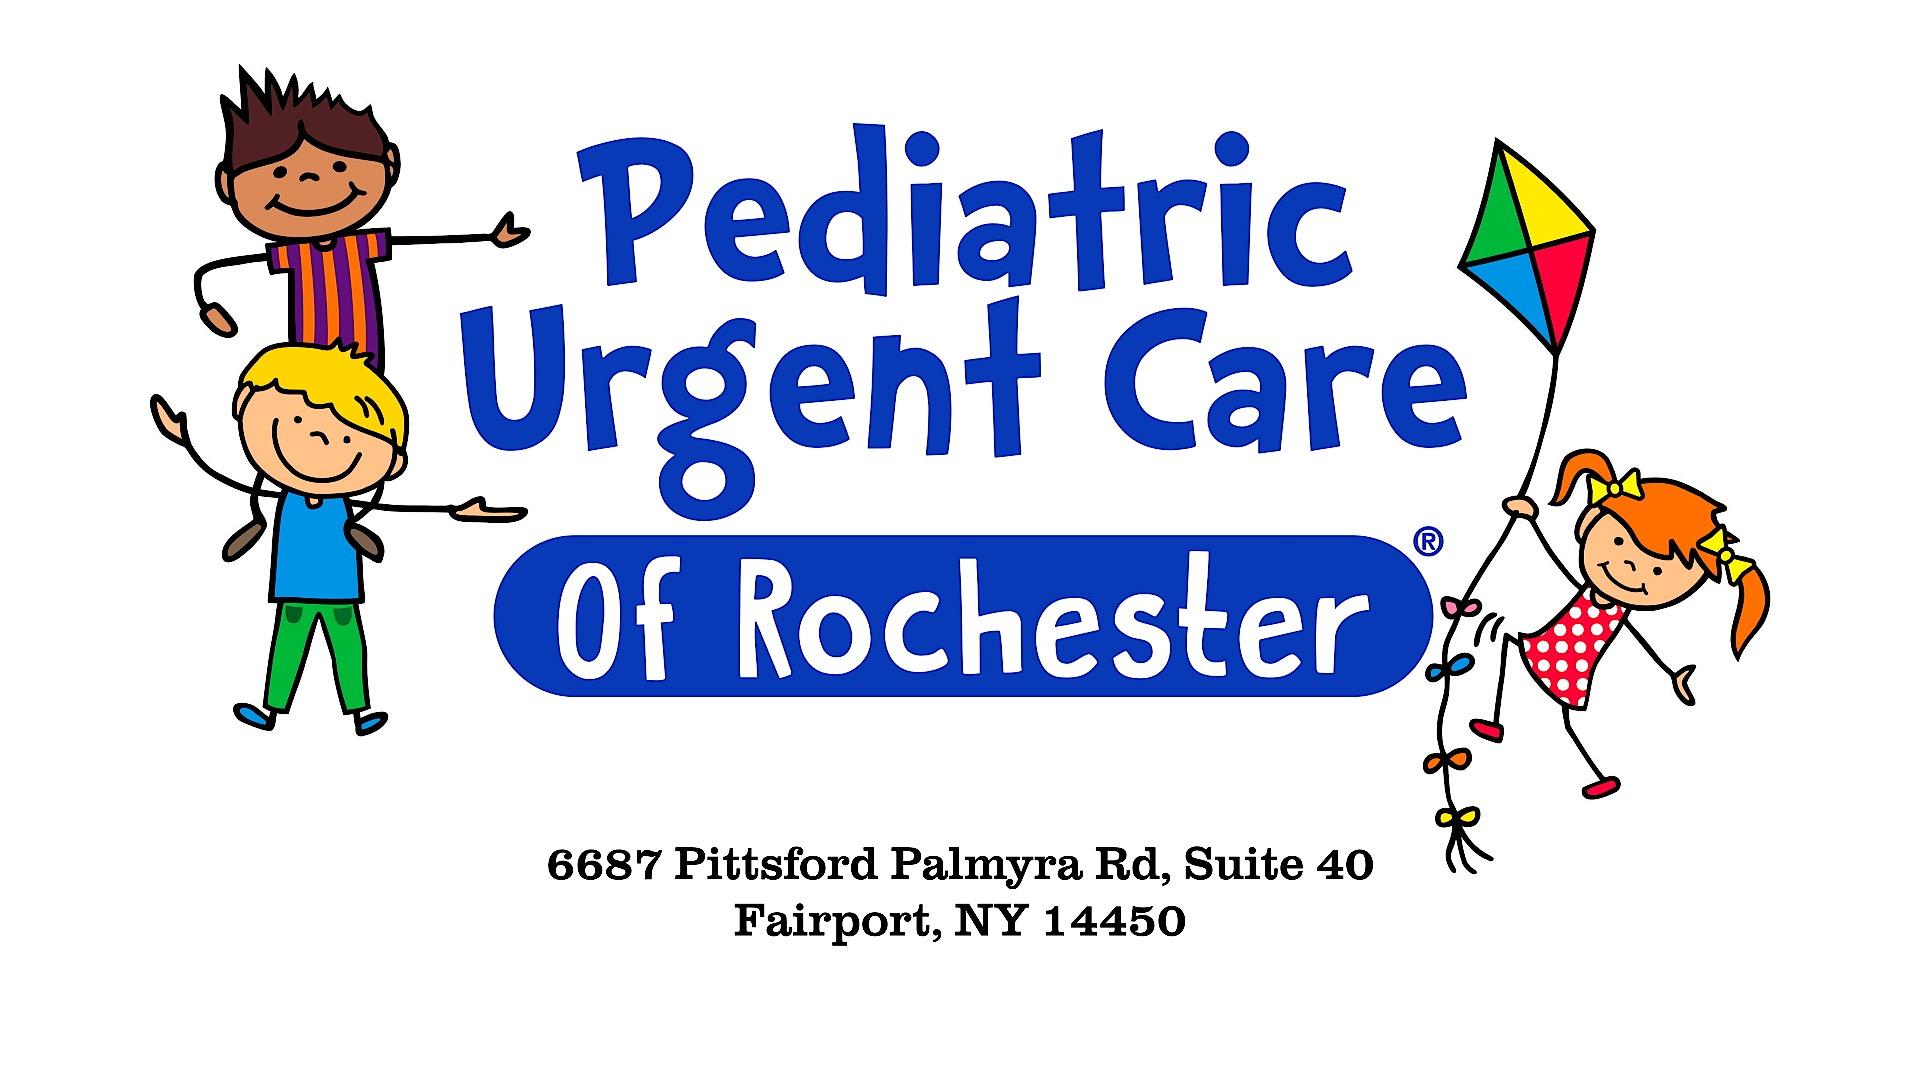 Pediatric Urgent Care of Rochester | Urgent Pediatric